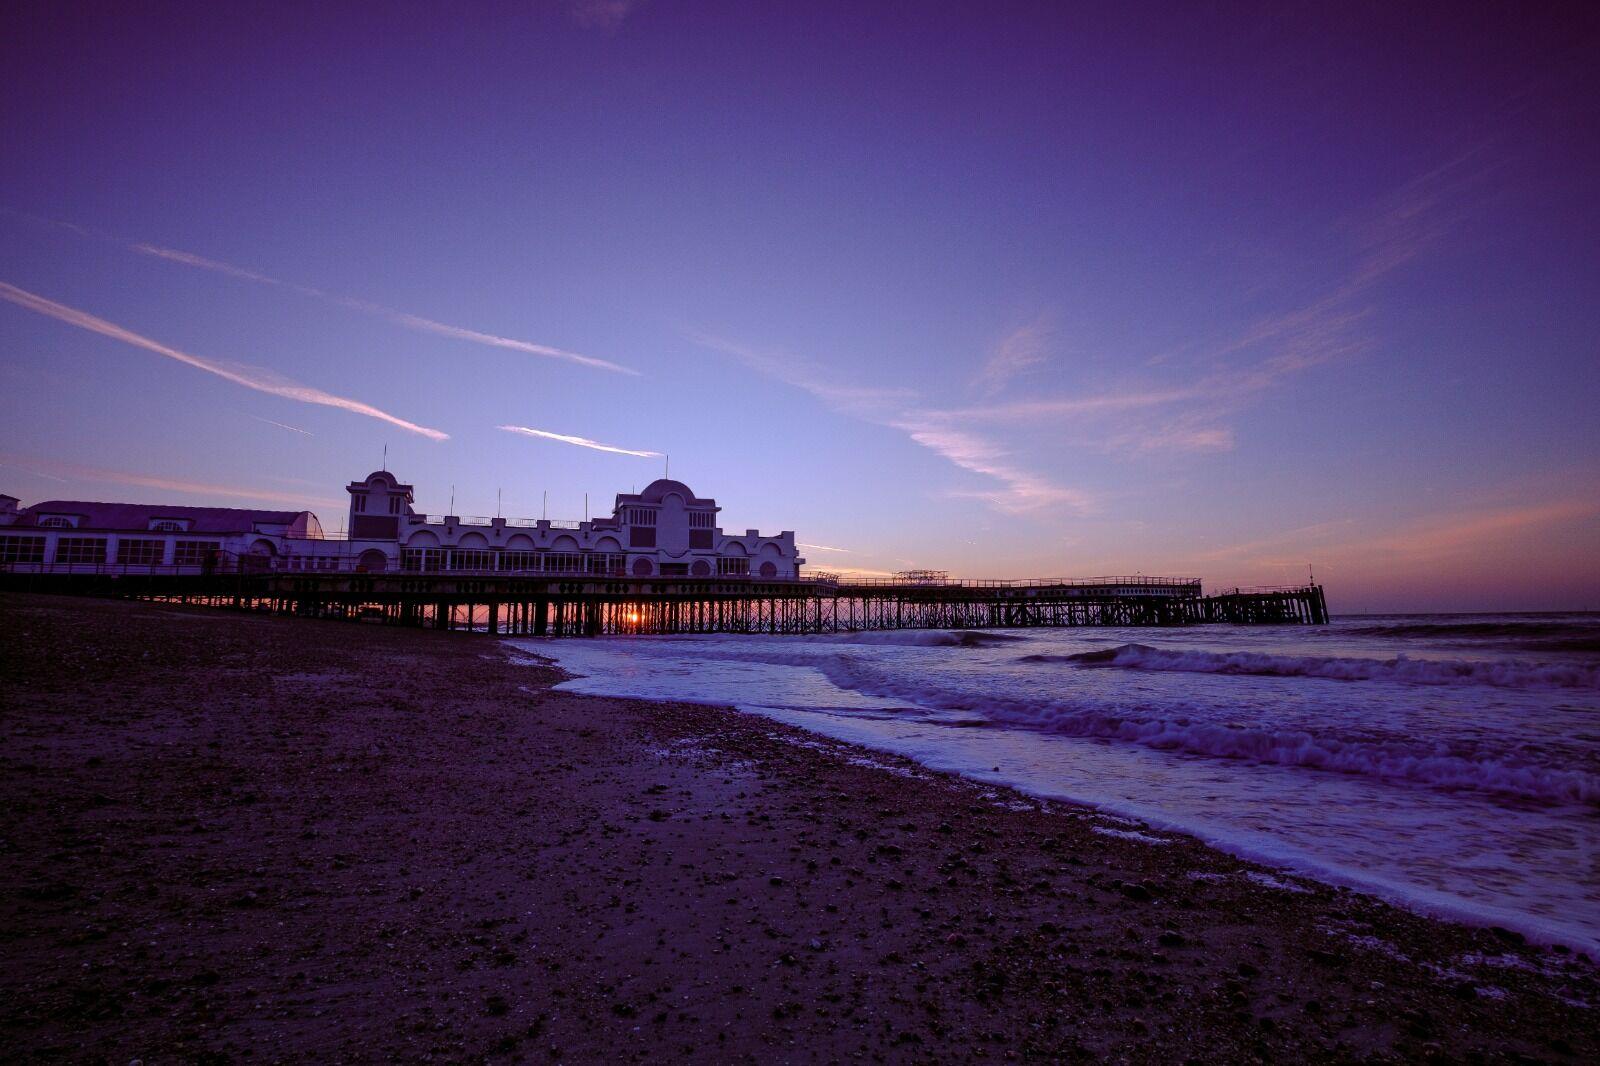 South Parade Pier Sunrise